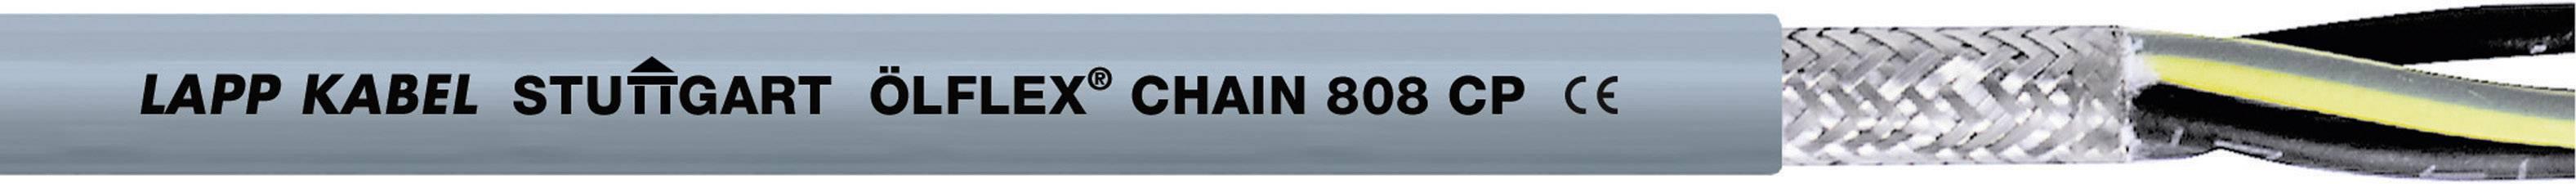 Žíla kabelu LappKabel ÖLFLEX CHAIN 808 CP 4G0,75 (1027761), 4x 0,75 mm², polyurethan, Ø 7,1 mm, stíněný, 50 m,